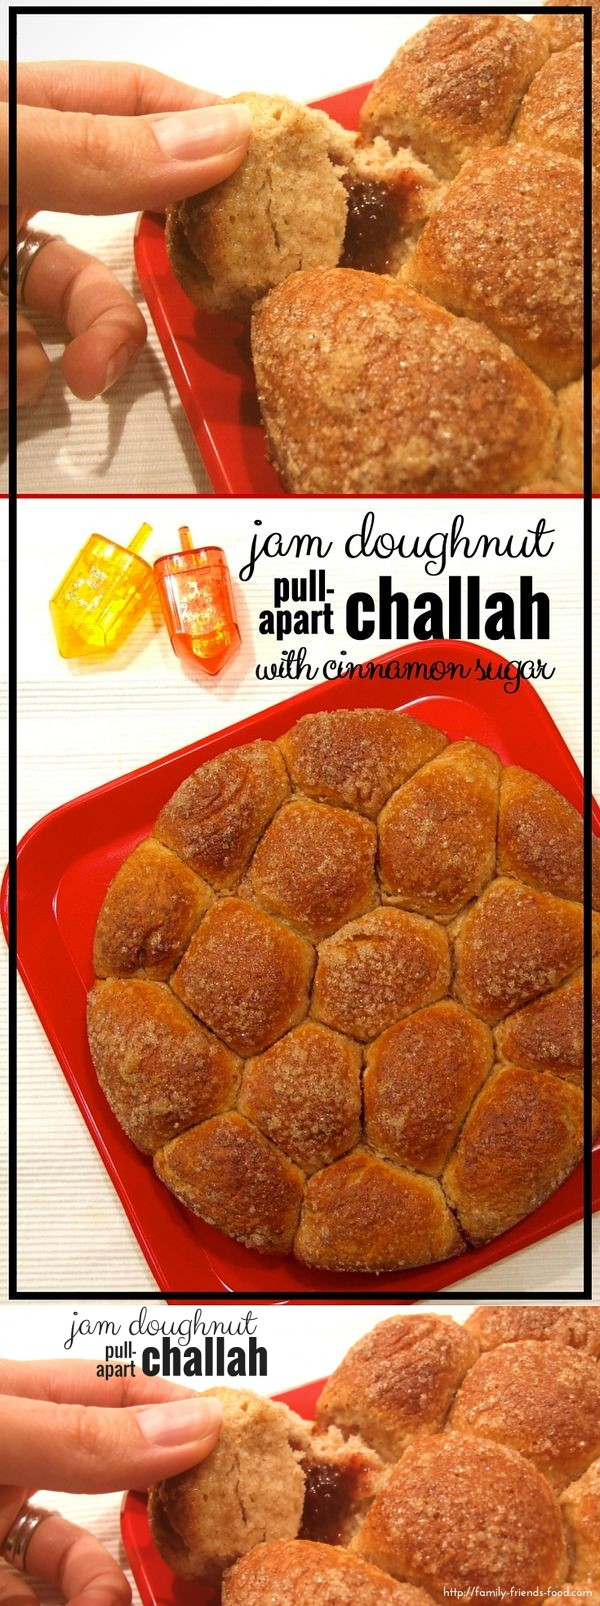 Jam doughnut pull-apart challah